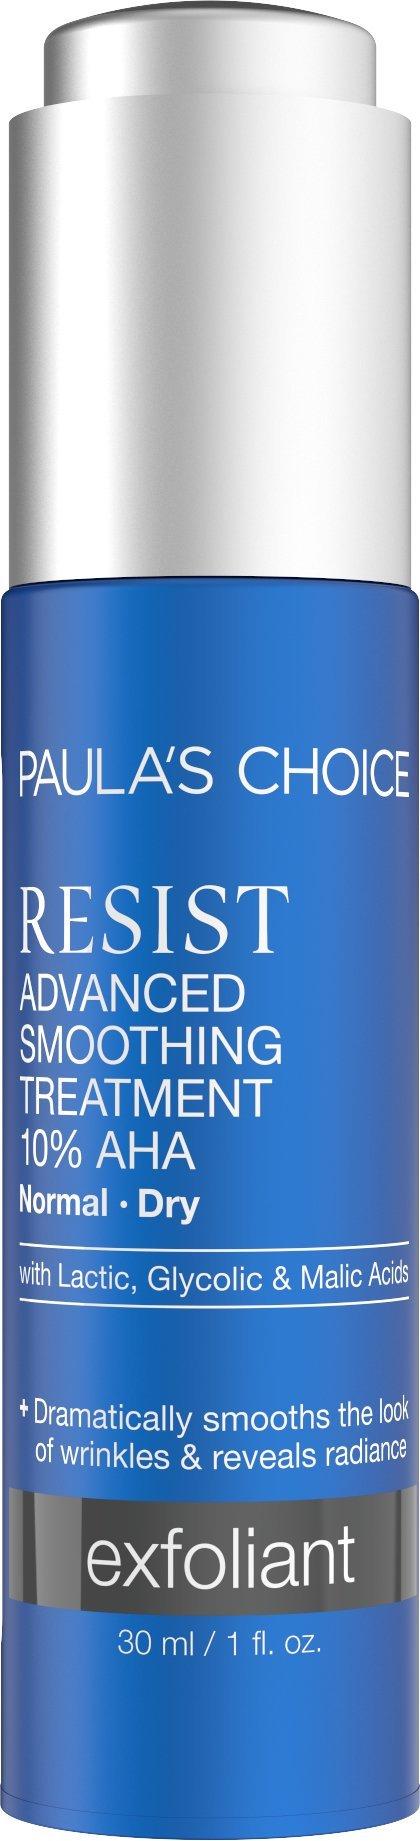 Paula's Choice RESIST Advanced Smoothing Treatment 10% AHA Serum, Glycolic Acid Exfoliator